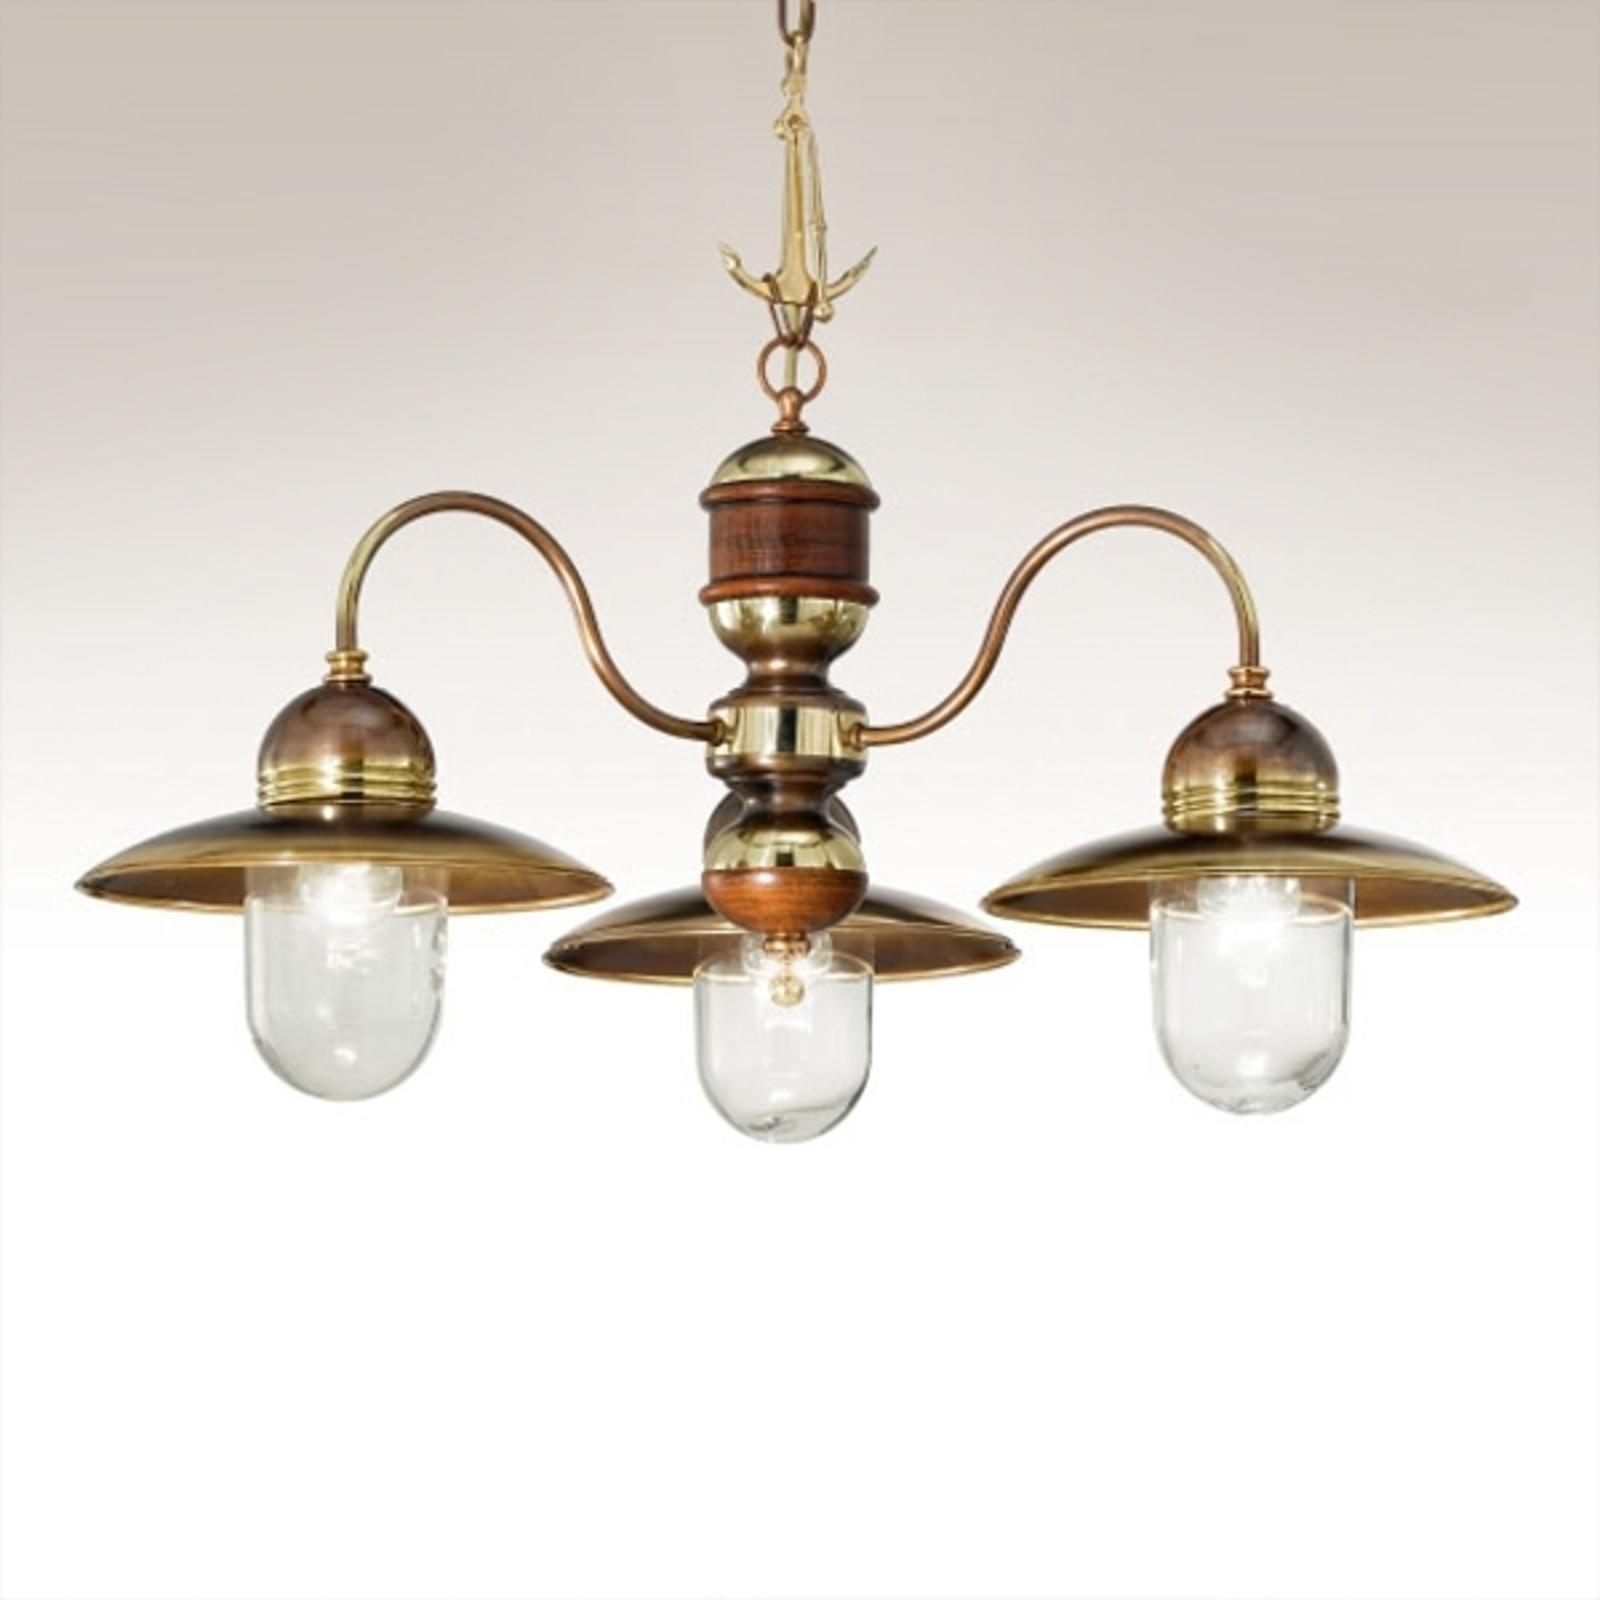 Lámpara colgante de 3 luces Faro